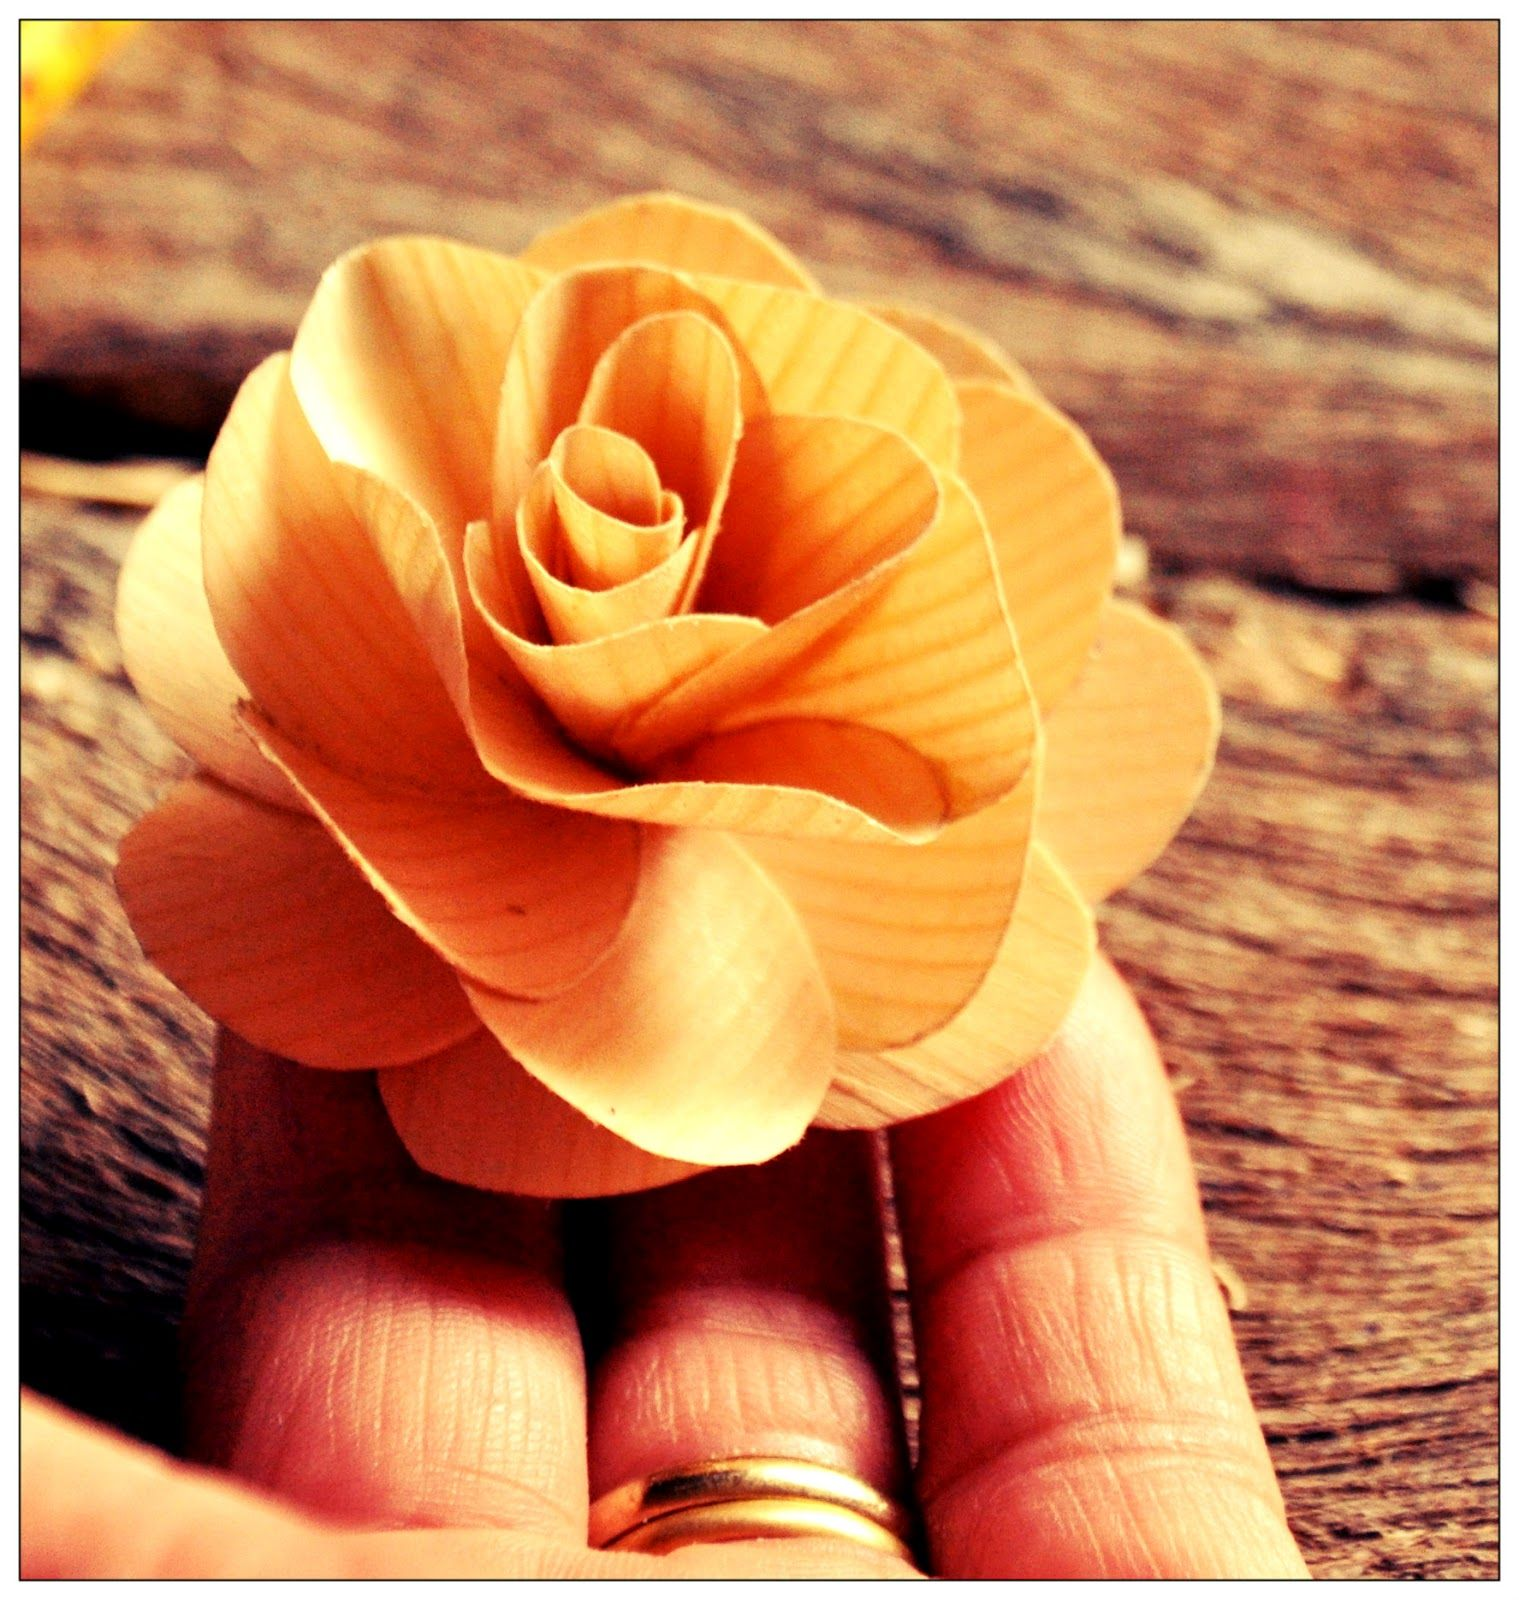 Wooden Roses For Weddings Wedding Favors Bouquets And Gifts Wood Roses Wooden Roses Wood Flowers